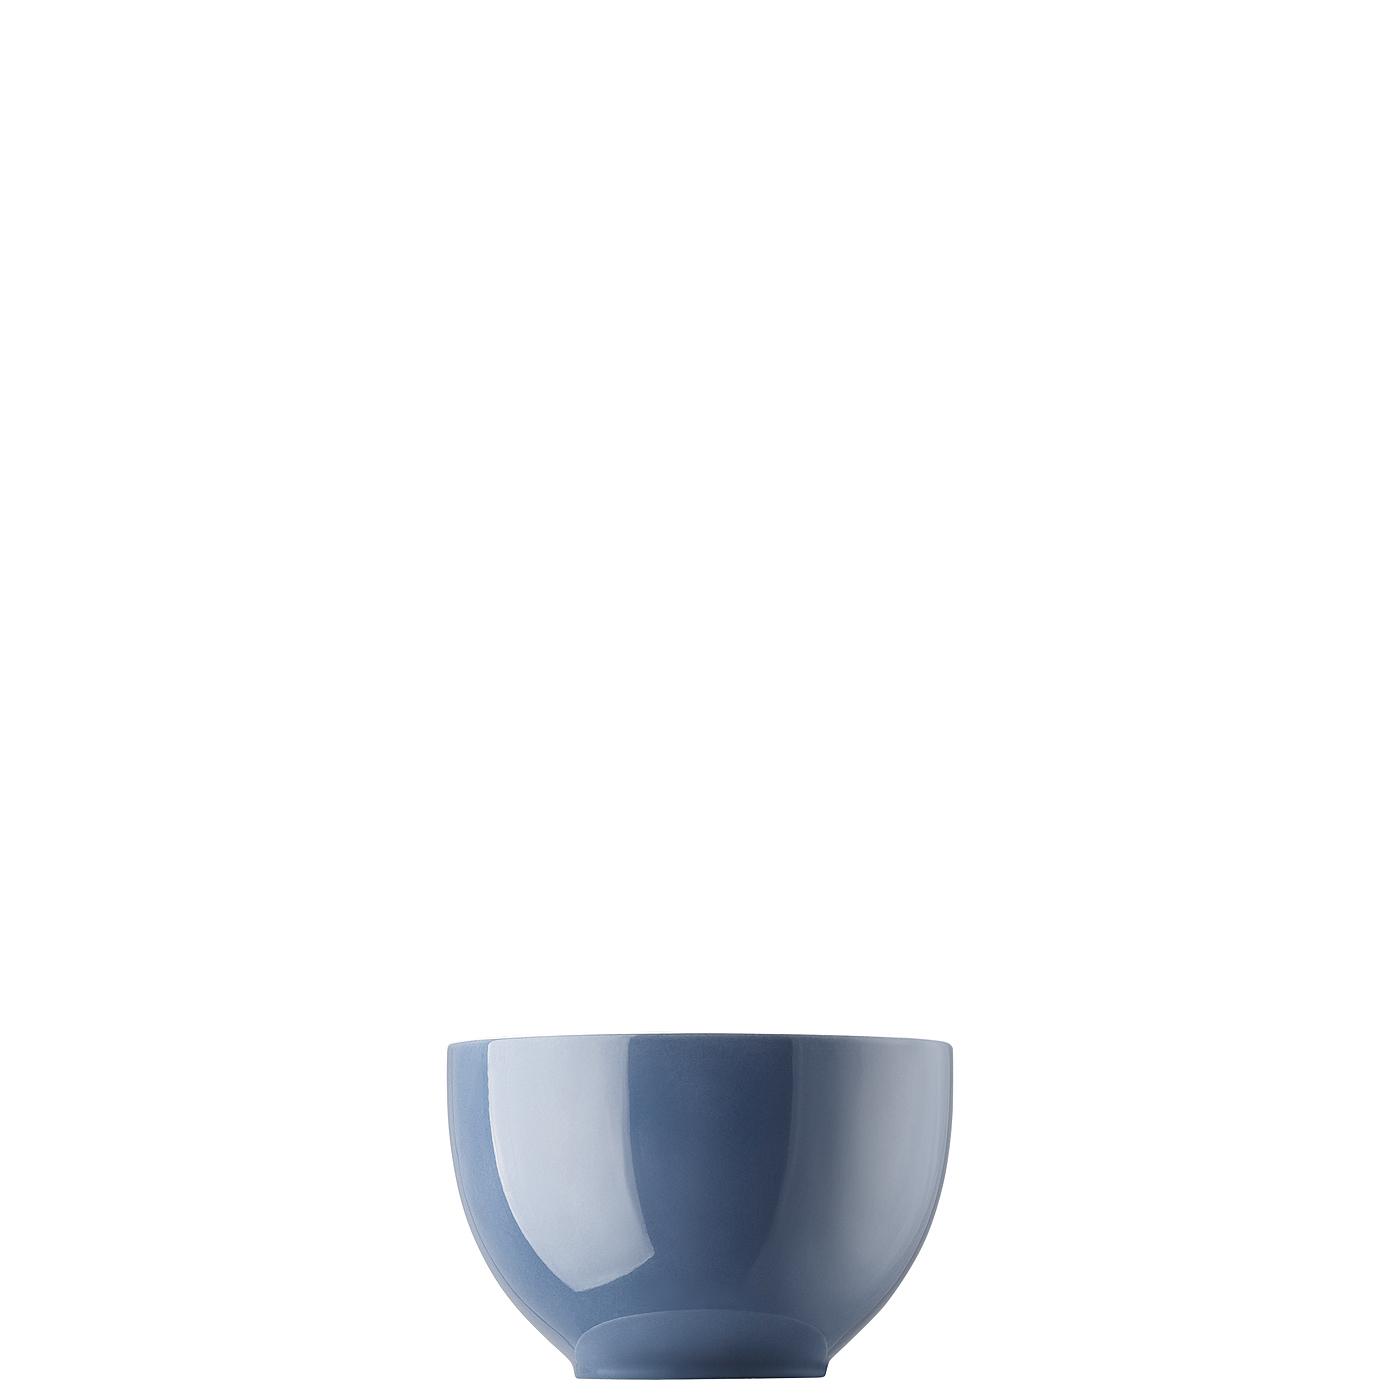 Müslischale Sunny Day Nordic Blue Thomas Porzellan